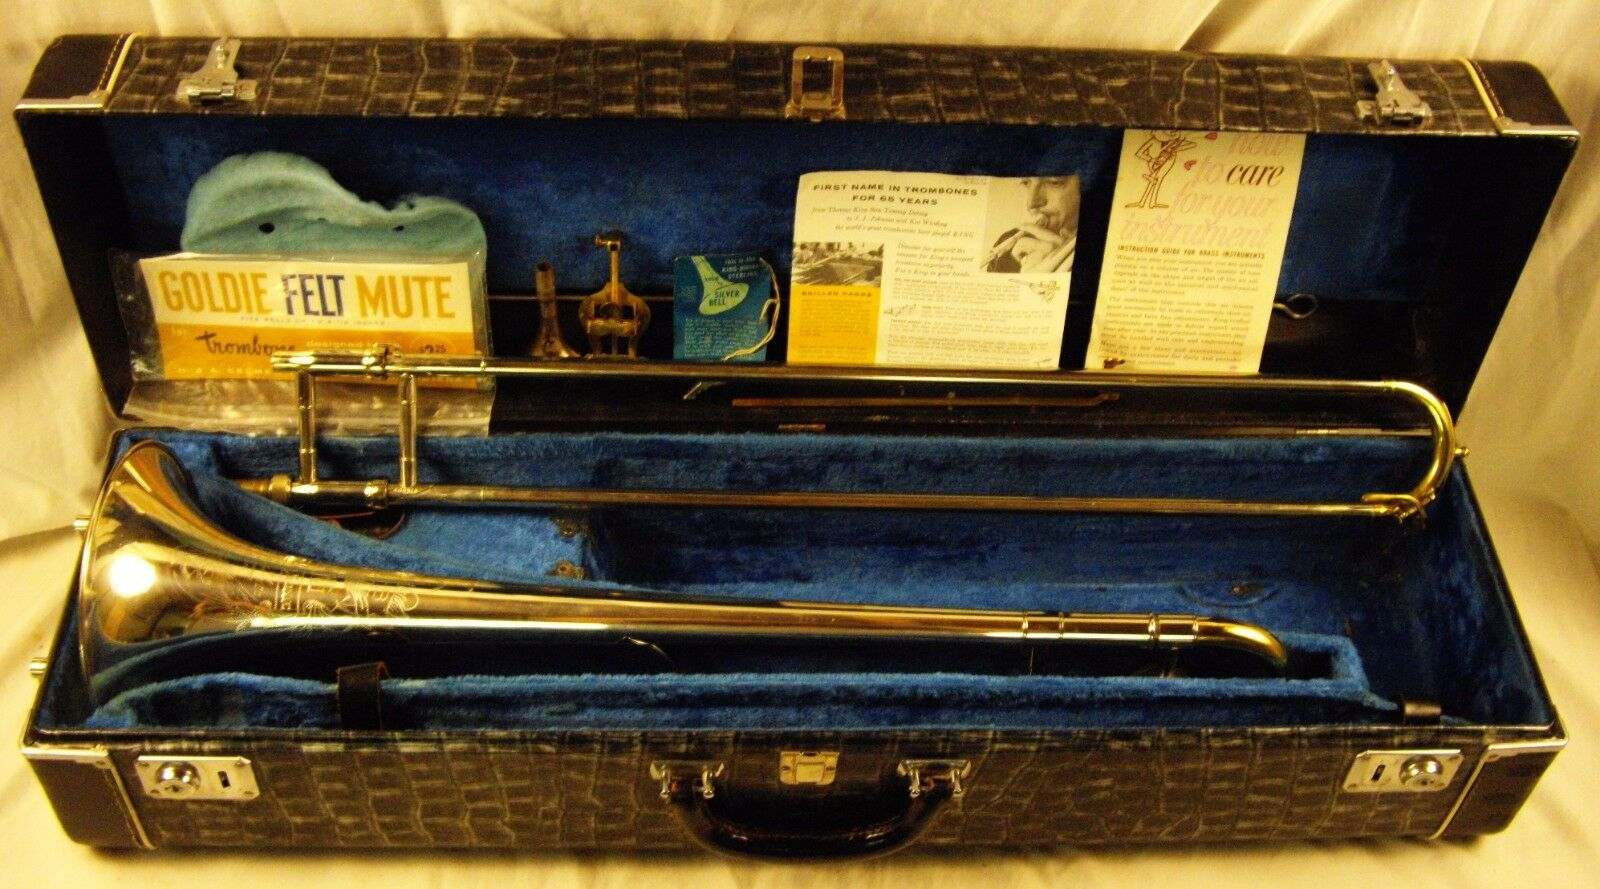 1959 H.N. WHITE KING 2B SILVERSONIC TENOR TROMBONE STERLING BELL COFFIN CASE WOW